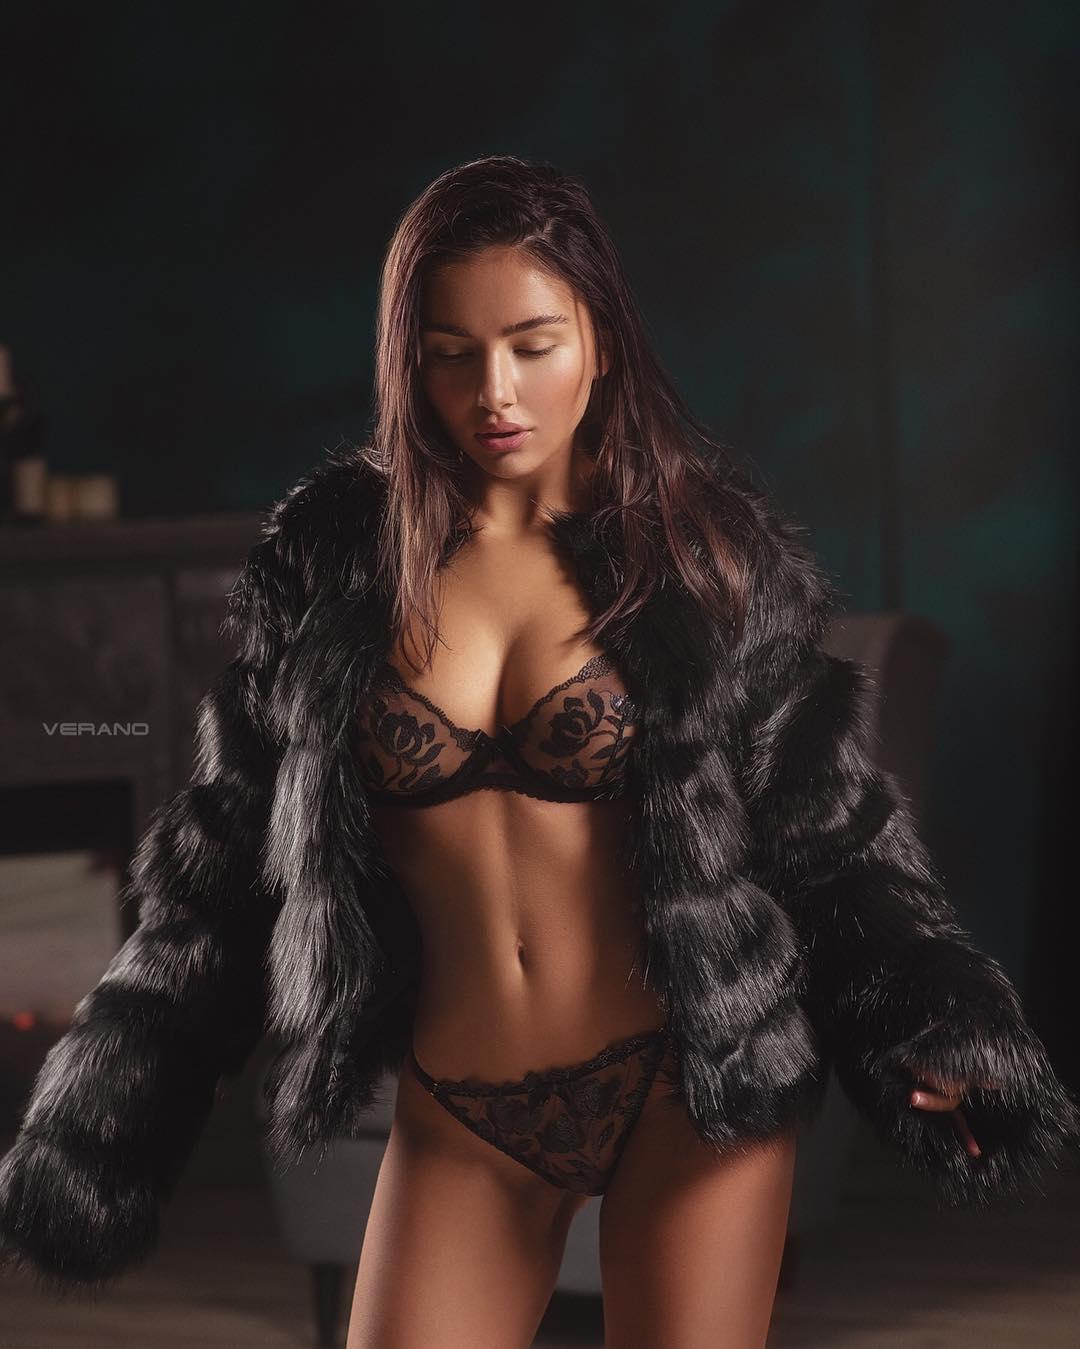 Pics Valeria Kovalenko nudes (21 foto and video), Ass, Sideboobs, Selfie, cameltoe 2015